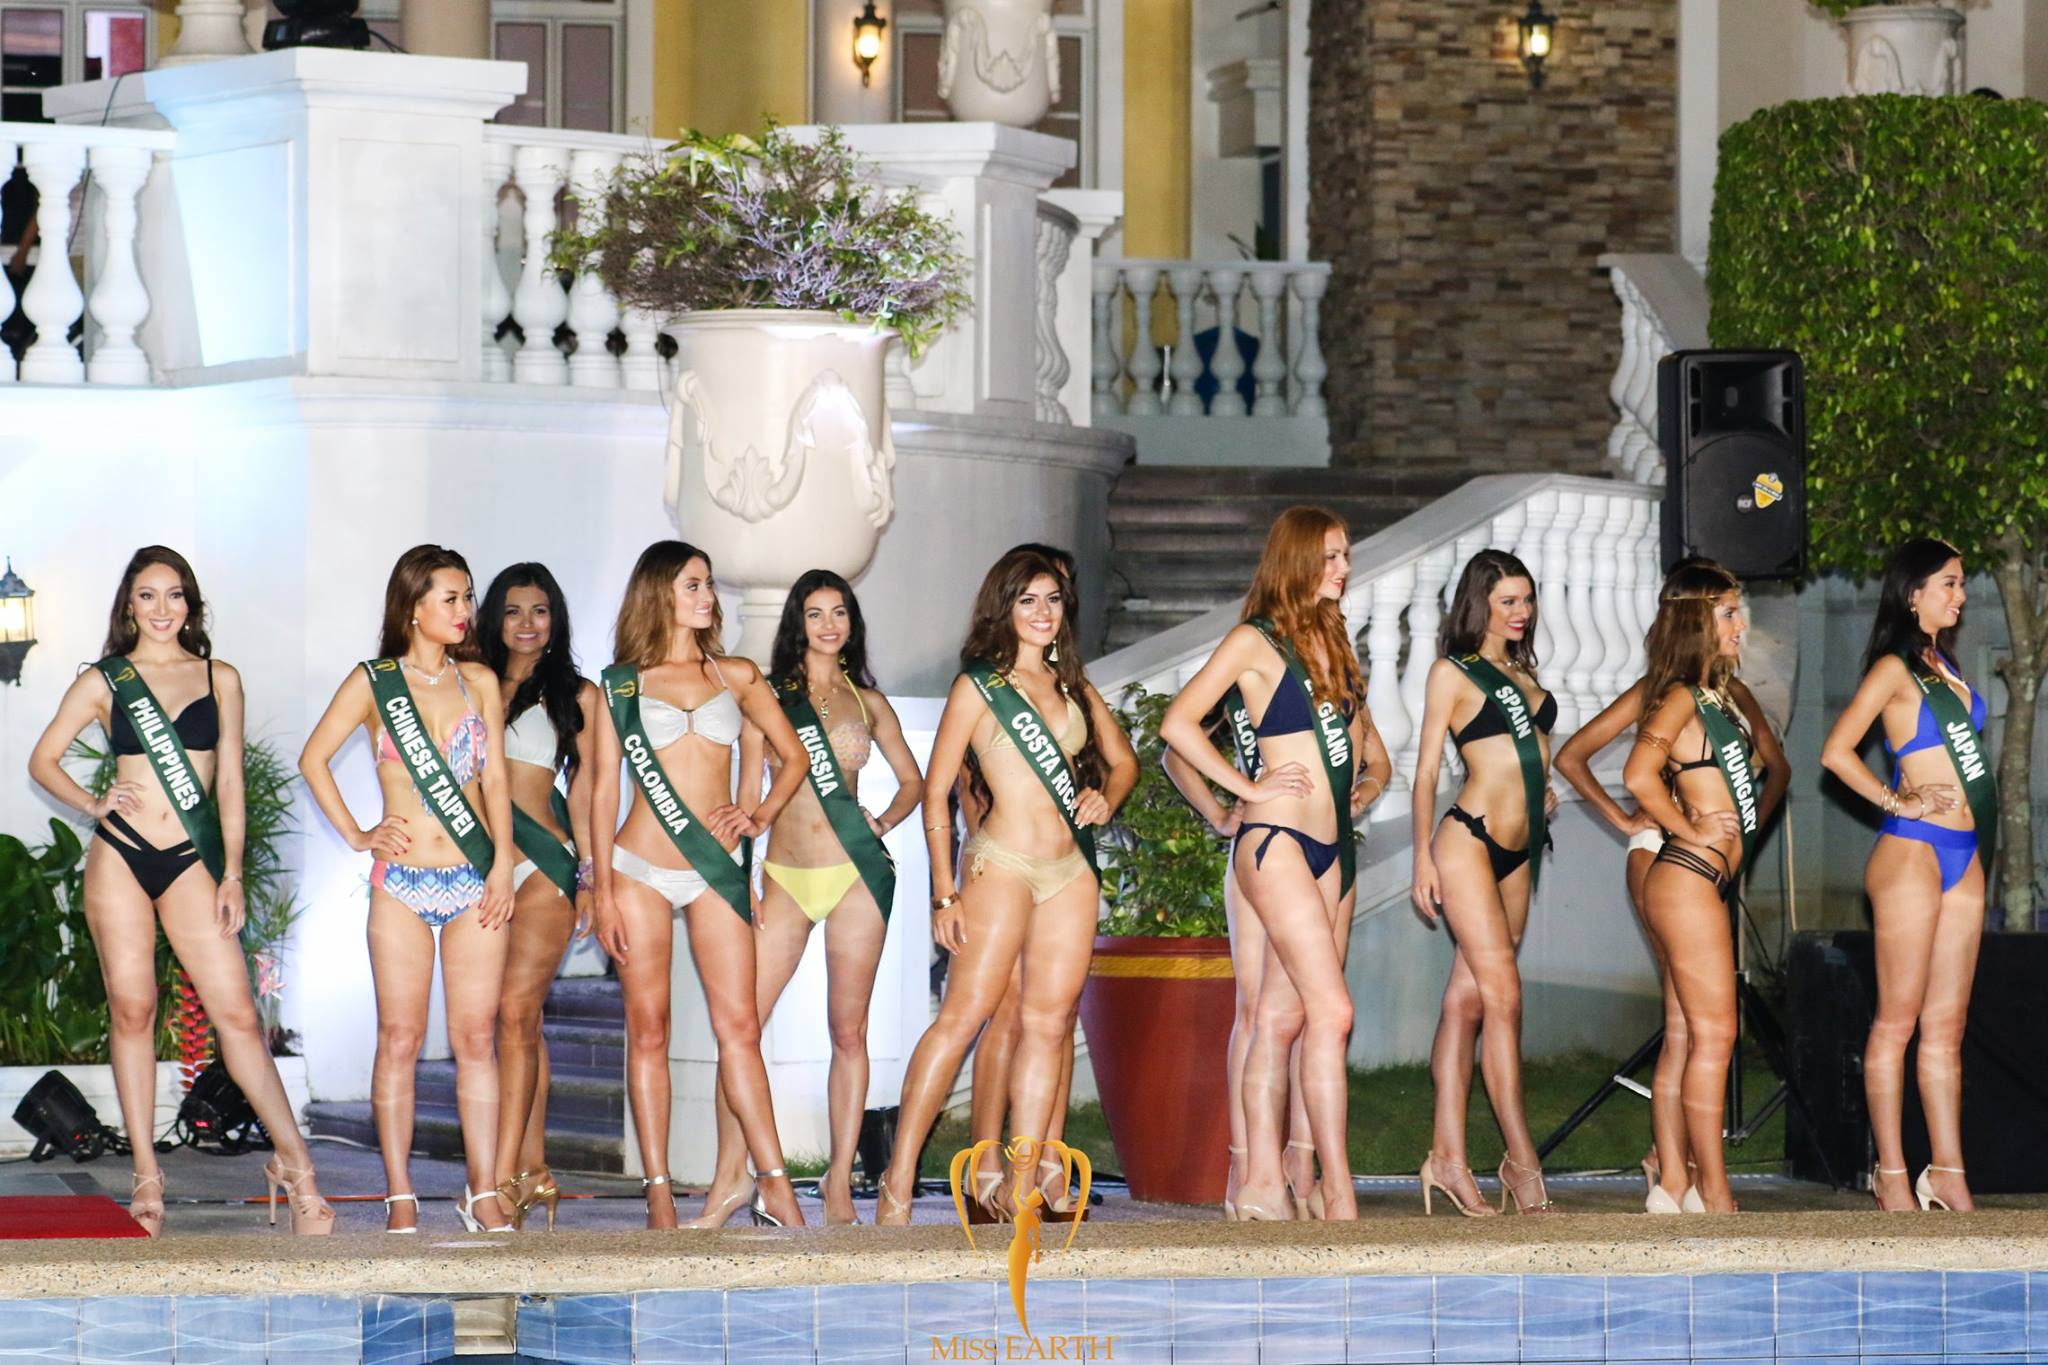 ainara de santamaria villamor, top 21 de miss grand international 2019/miss world cantabria 2018/miss earth spain 2017. - Página 4 54041739_22459433_1535029039915149_7923834675519880946_o